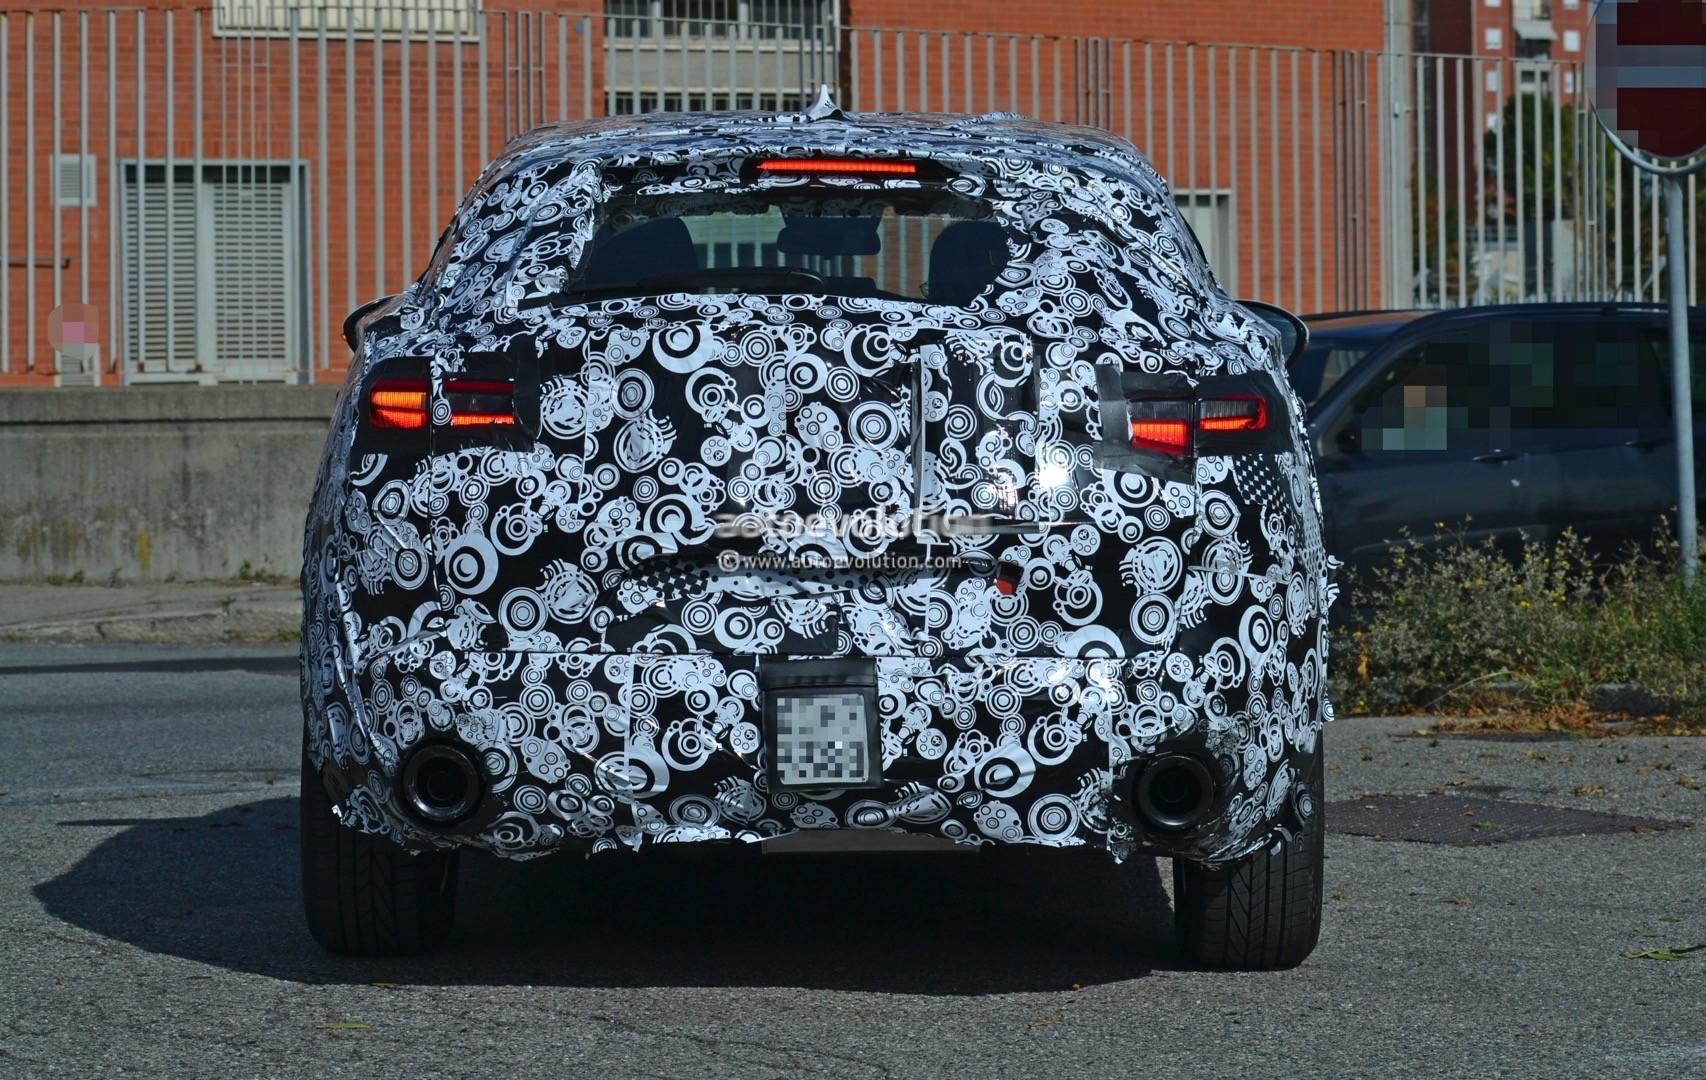 2017 Alfa Romeo Stelvio Tipo 949 Spied Again Shows Headlights And Tail Lights D Suv